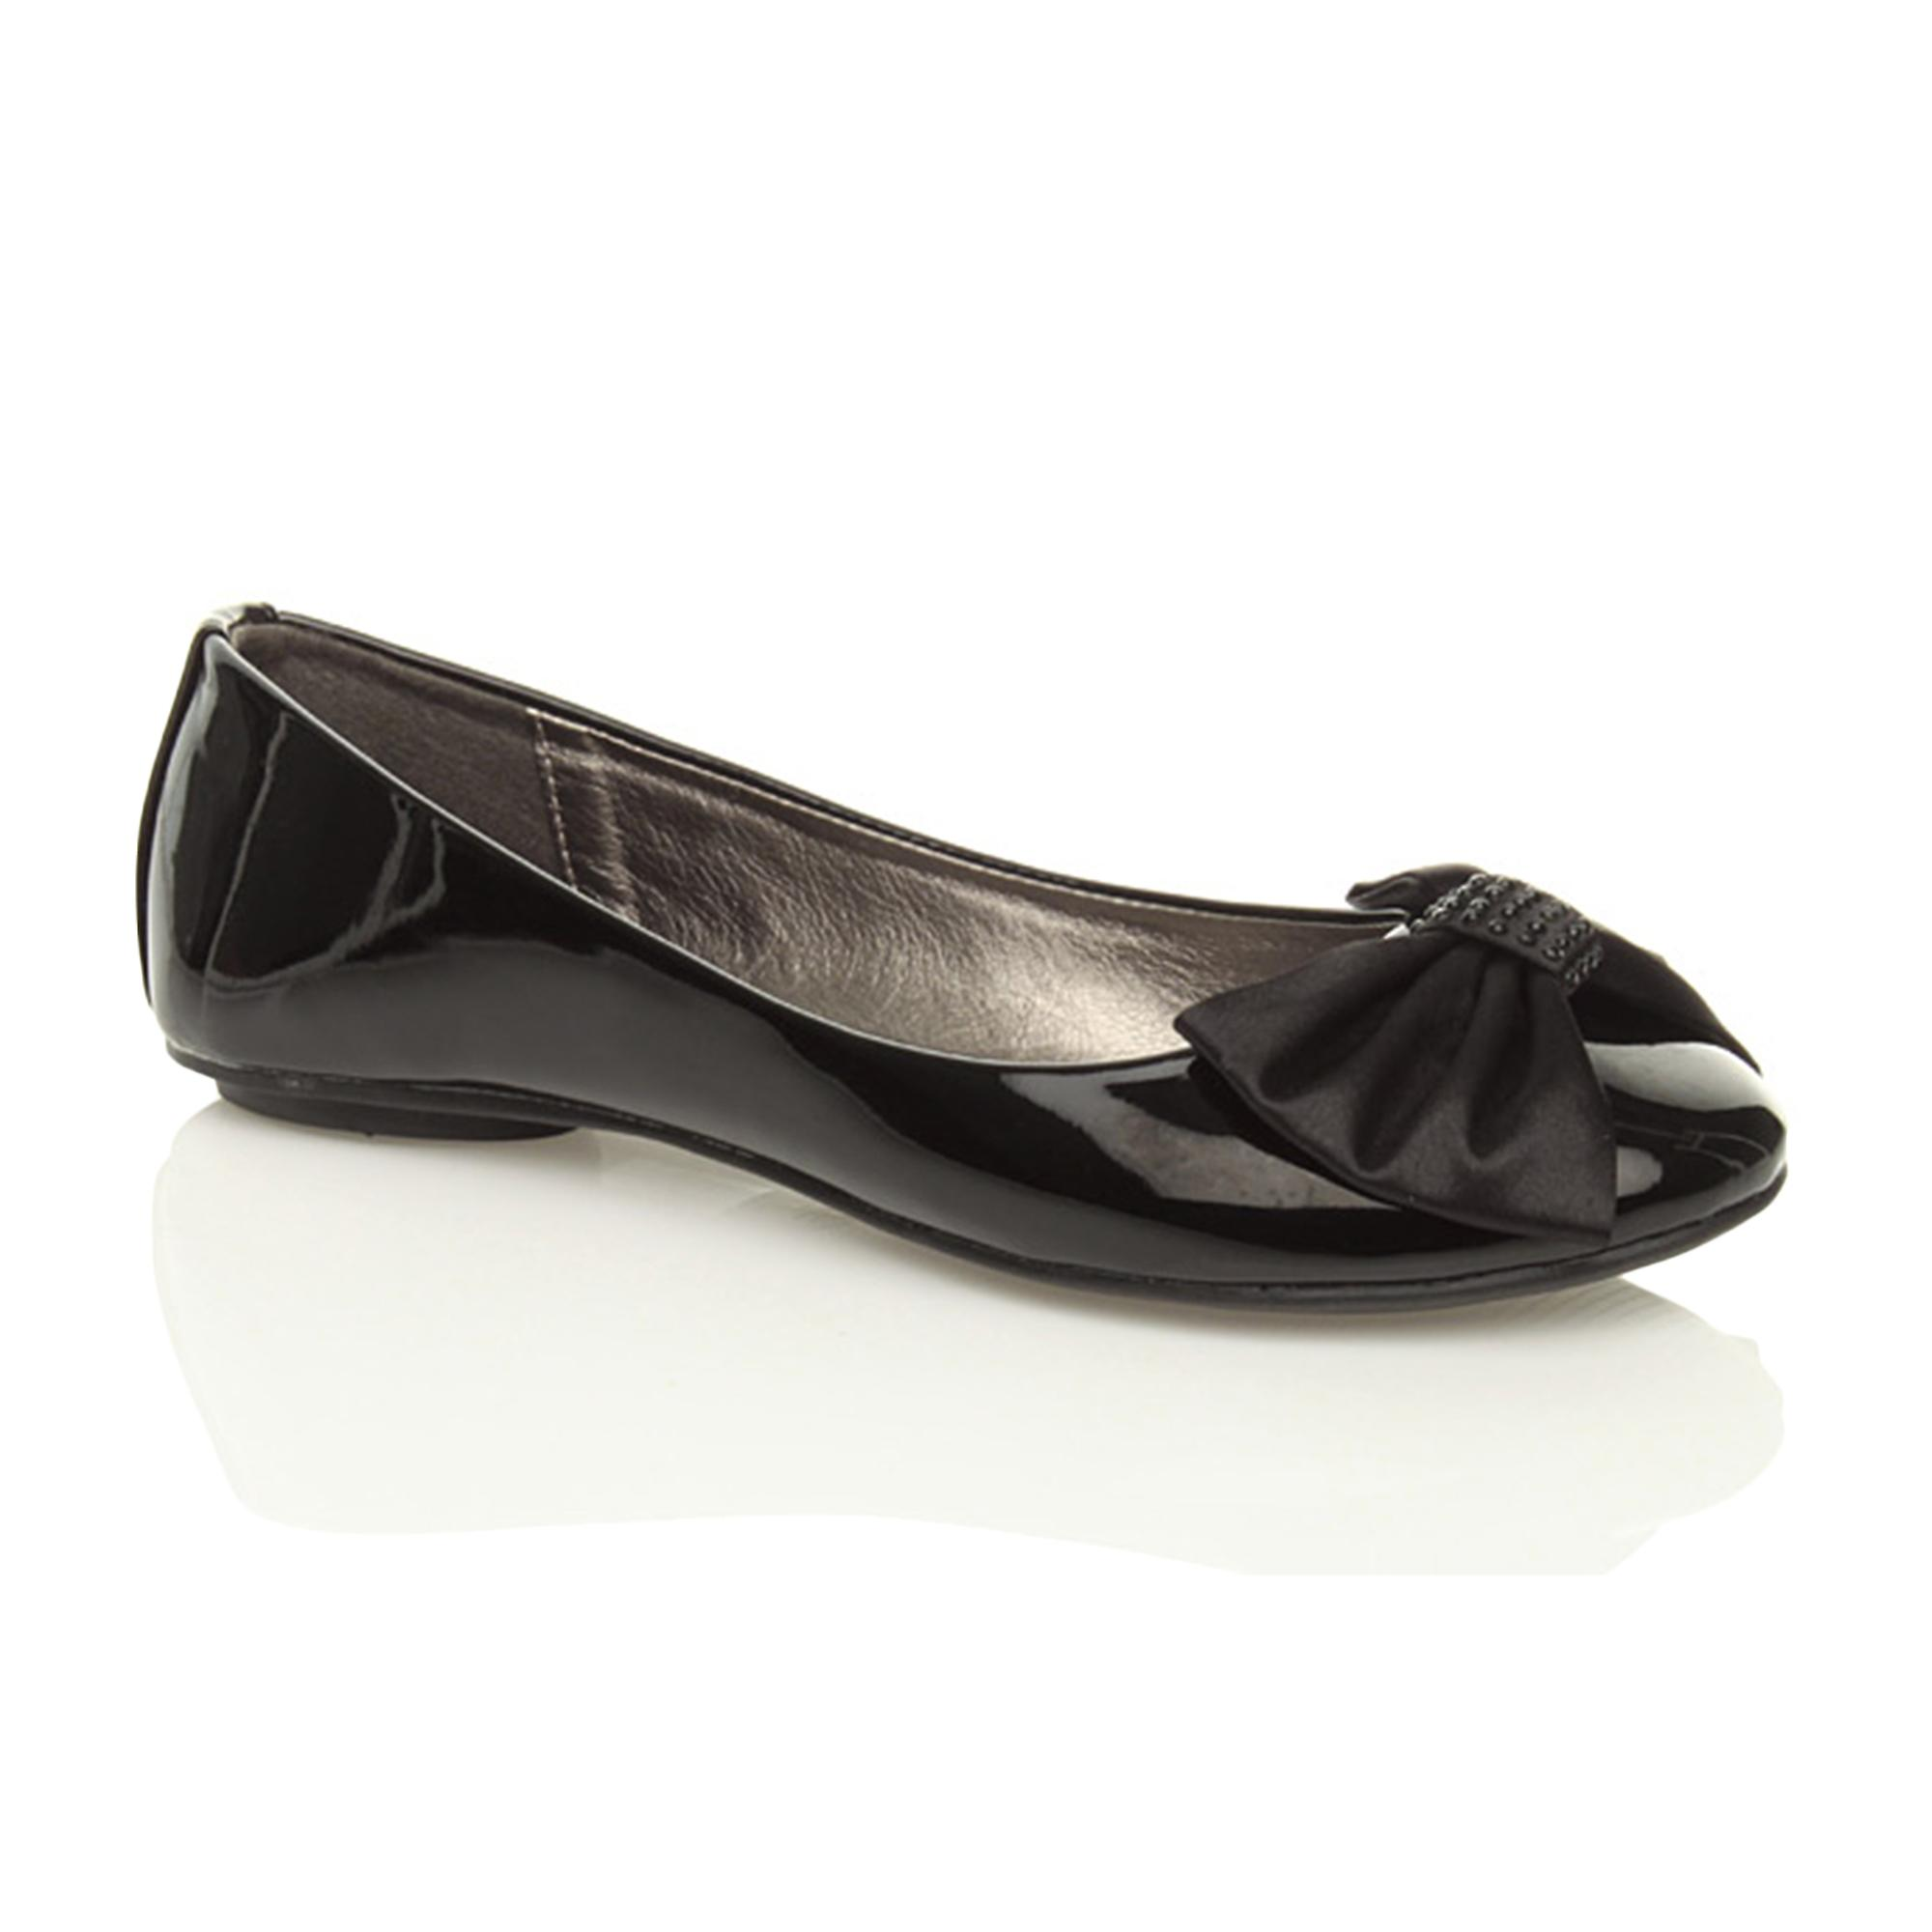 Ajvani womens flat low heel ballerina dolly shoes loafers slip on bow pumps ballet flats